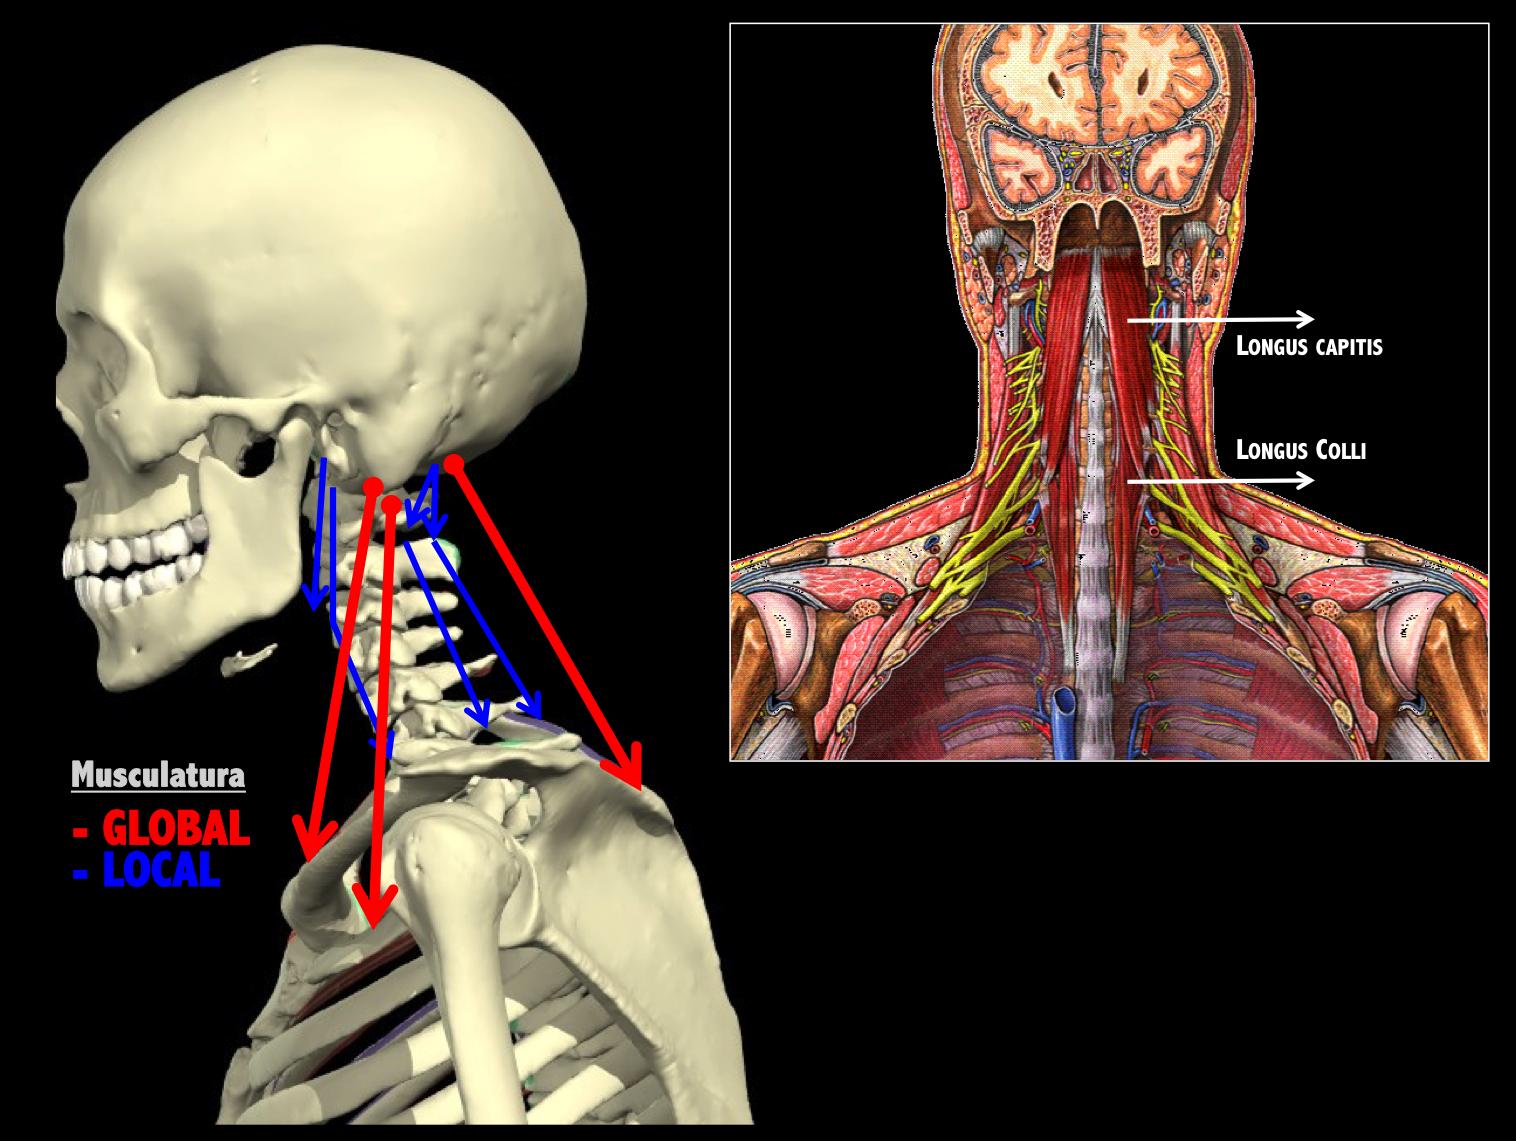 Investigation of the morphology of longus colli among